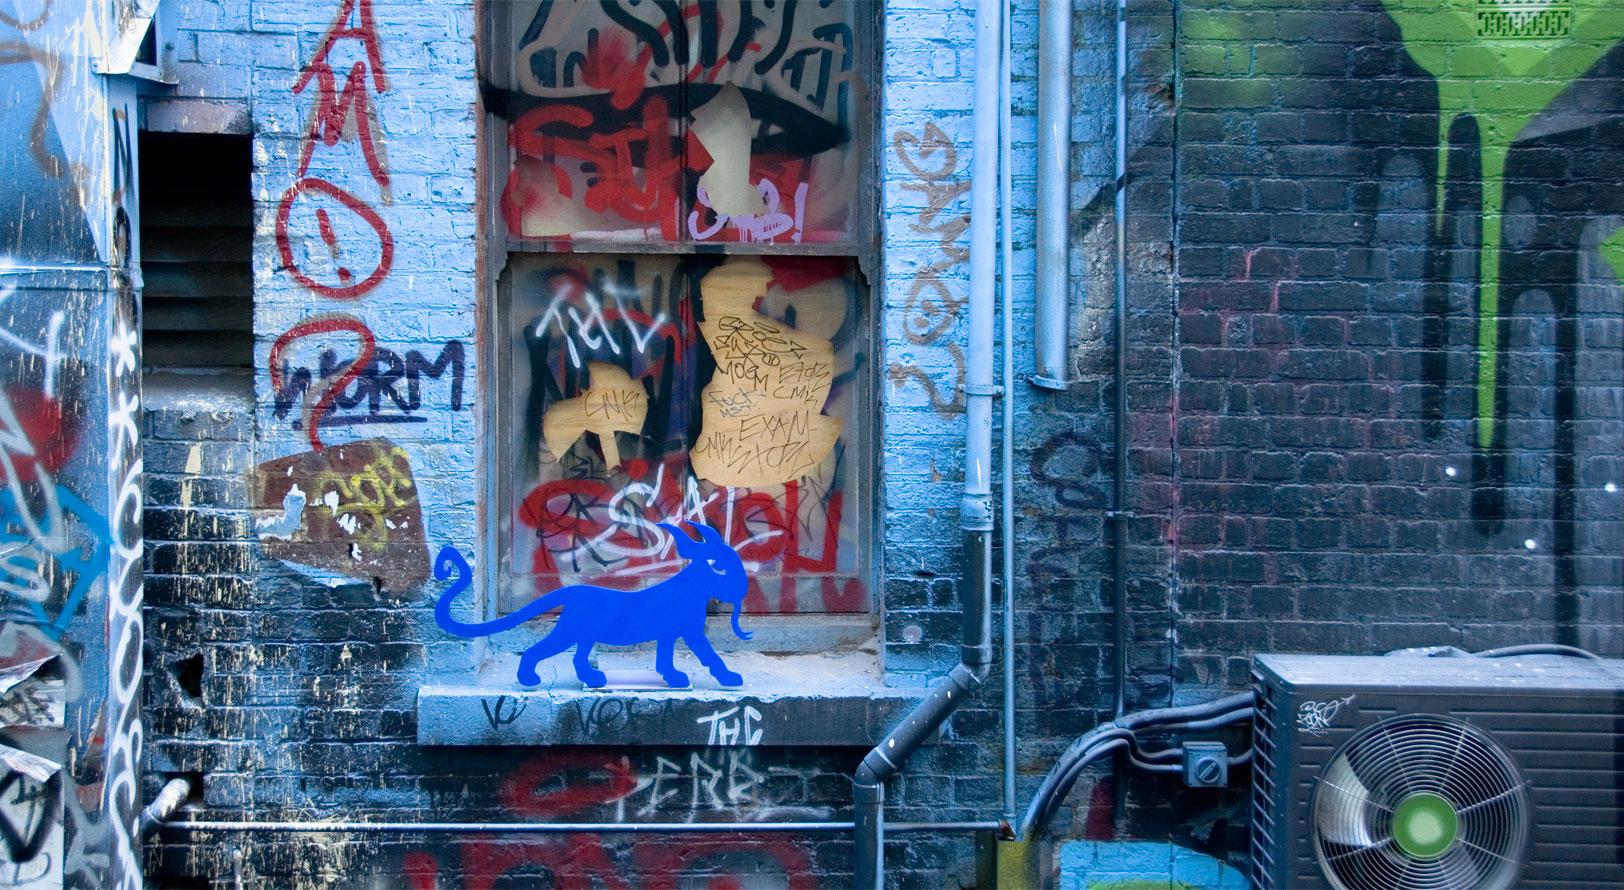 all-those-shapes_-_blu-art-xinja_-_kitty-lizard-on-the-ledge_-_rutledge